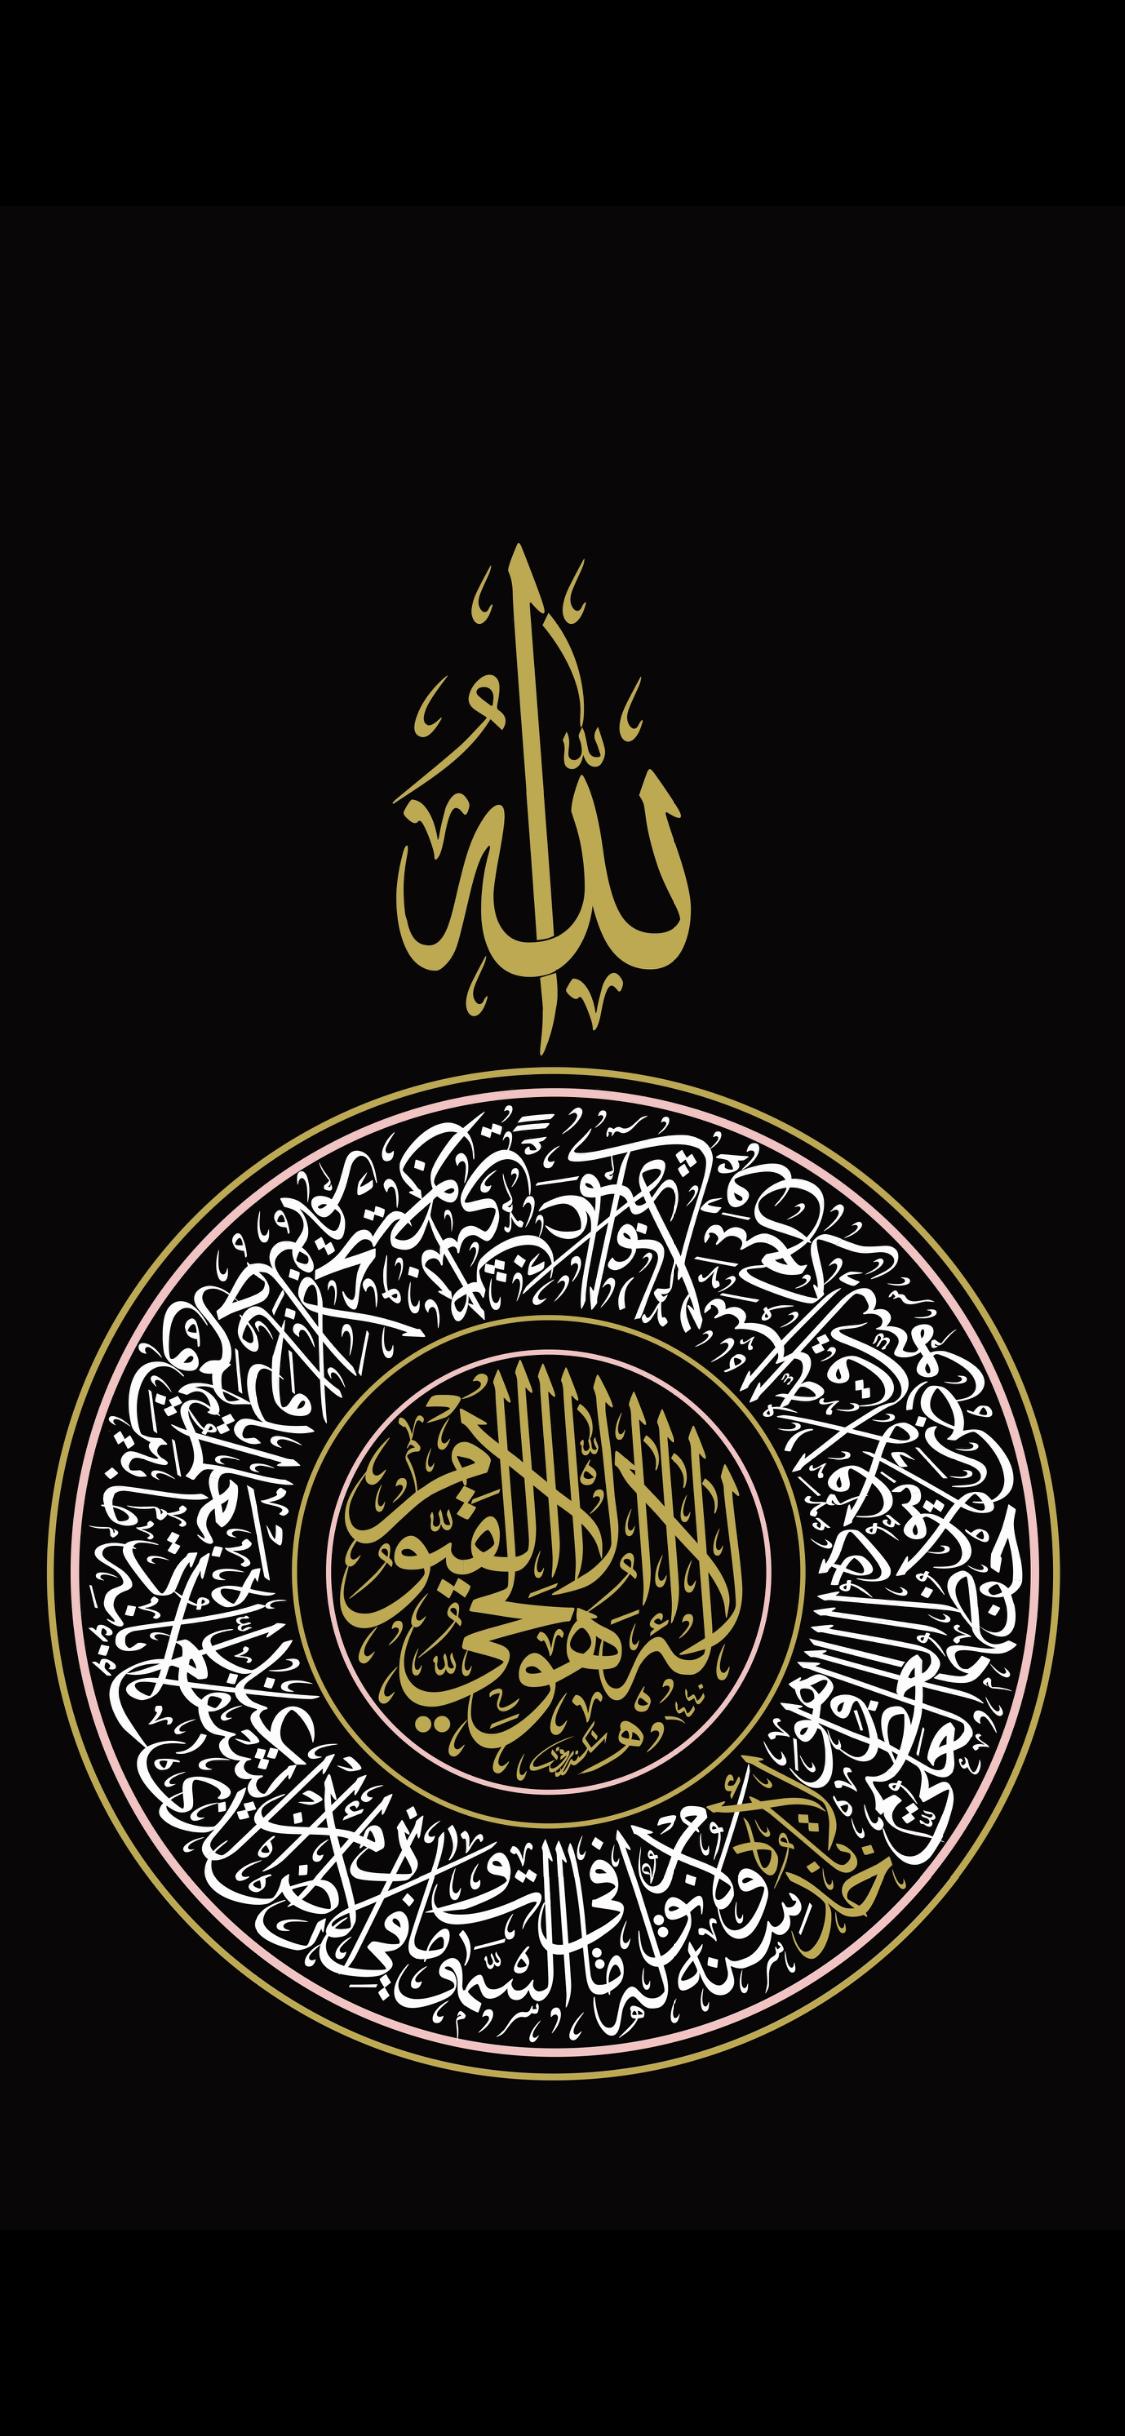 Pin Oleh Sle Di Islamic Calligraphy Seni Islamis Seni Kaligrafi Kaligrafi Islam